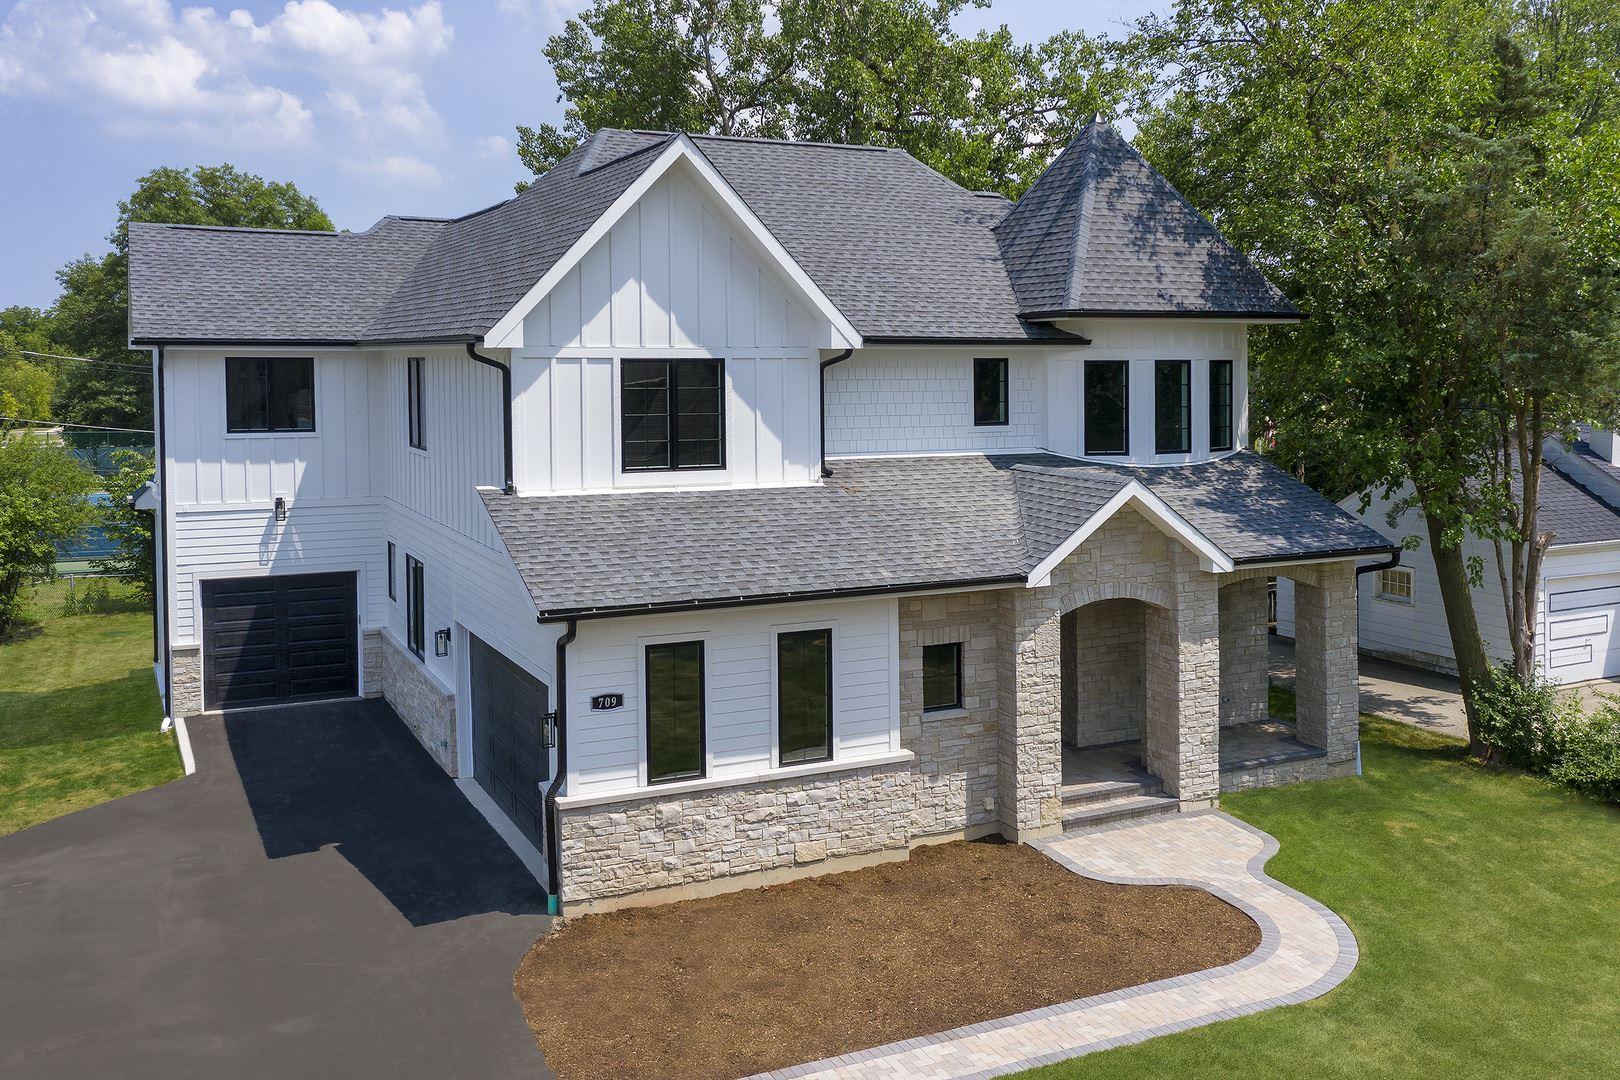 709 Glenwood Lane, Glenview, IL 60025 - #: 10728139